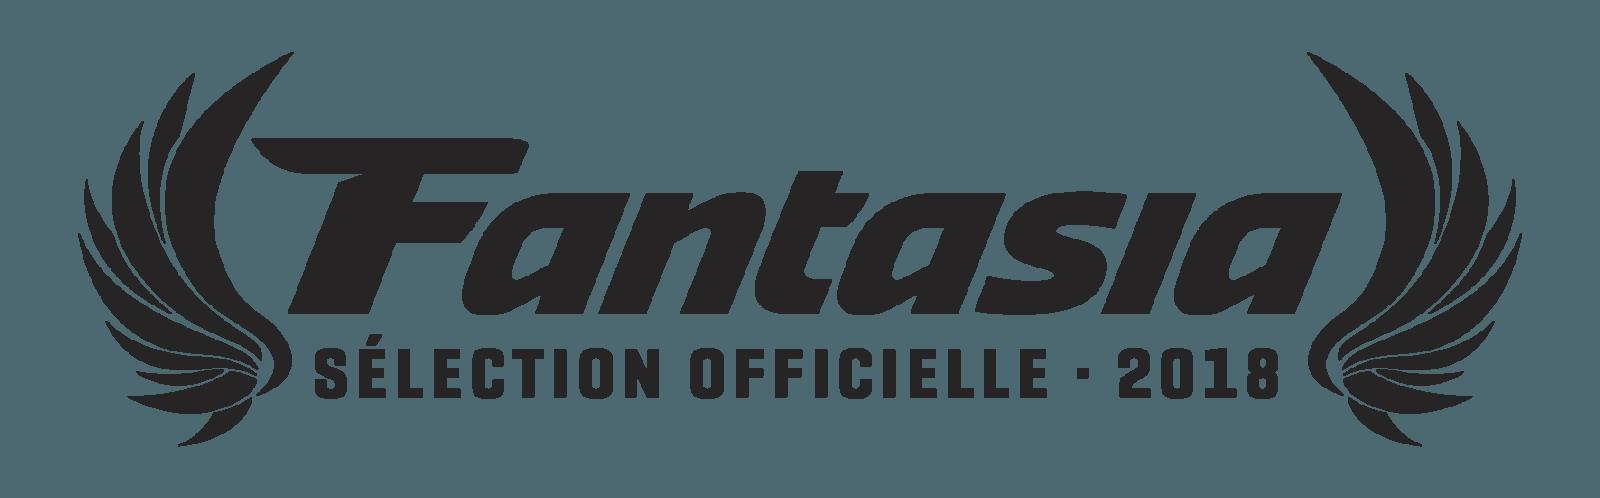 Brothers Nest Fantasia Film Festival 2018 Premiere Moviehooker